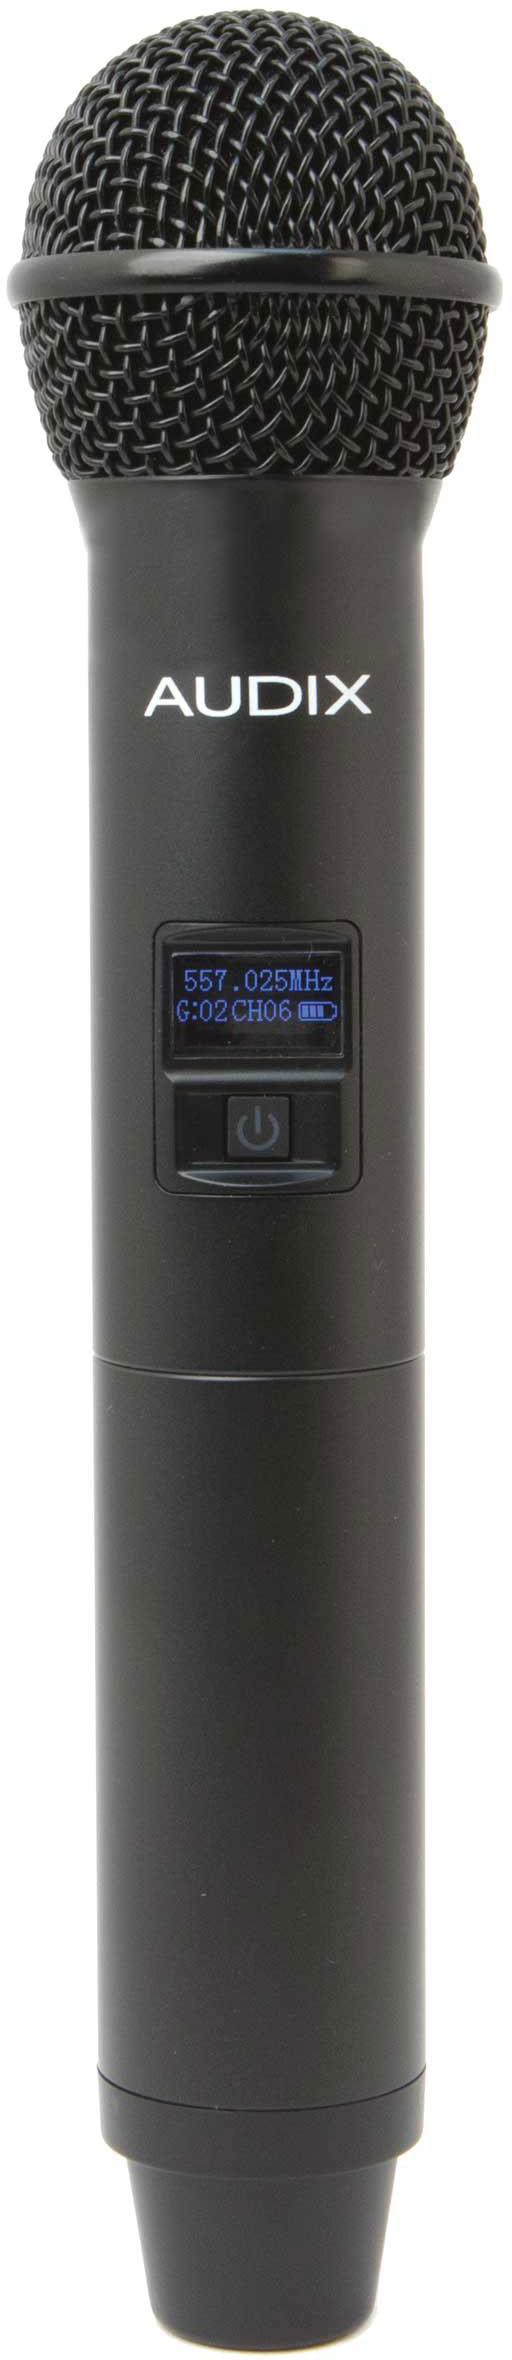 AUDIX-H60-OM2-sku-65298048243